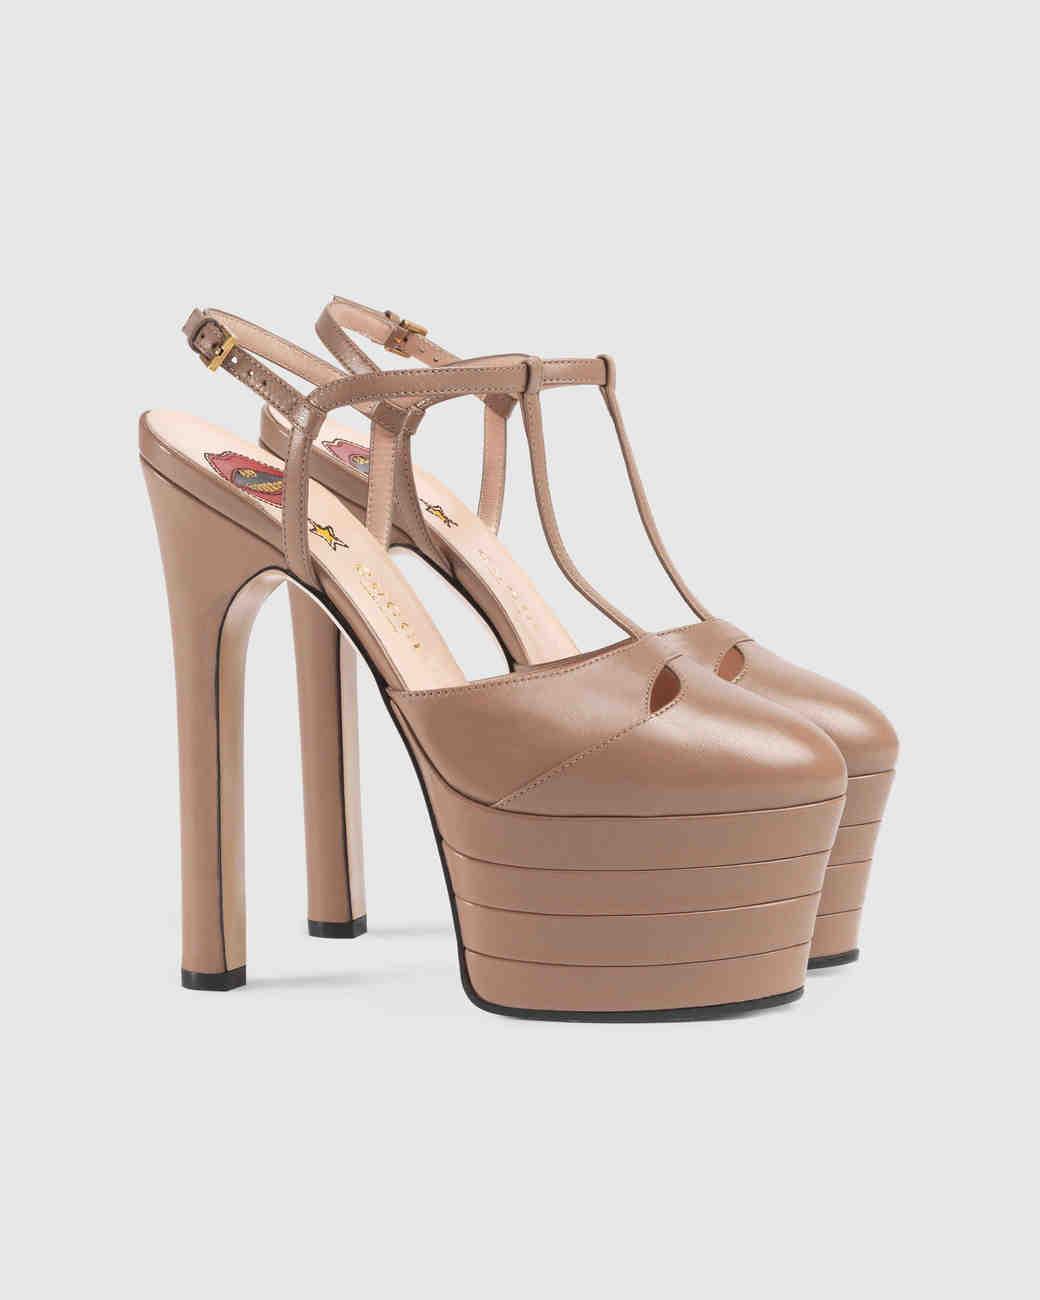 Gucci Nude Heels